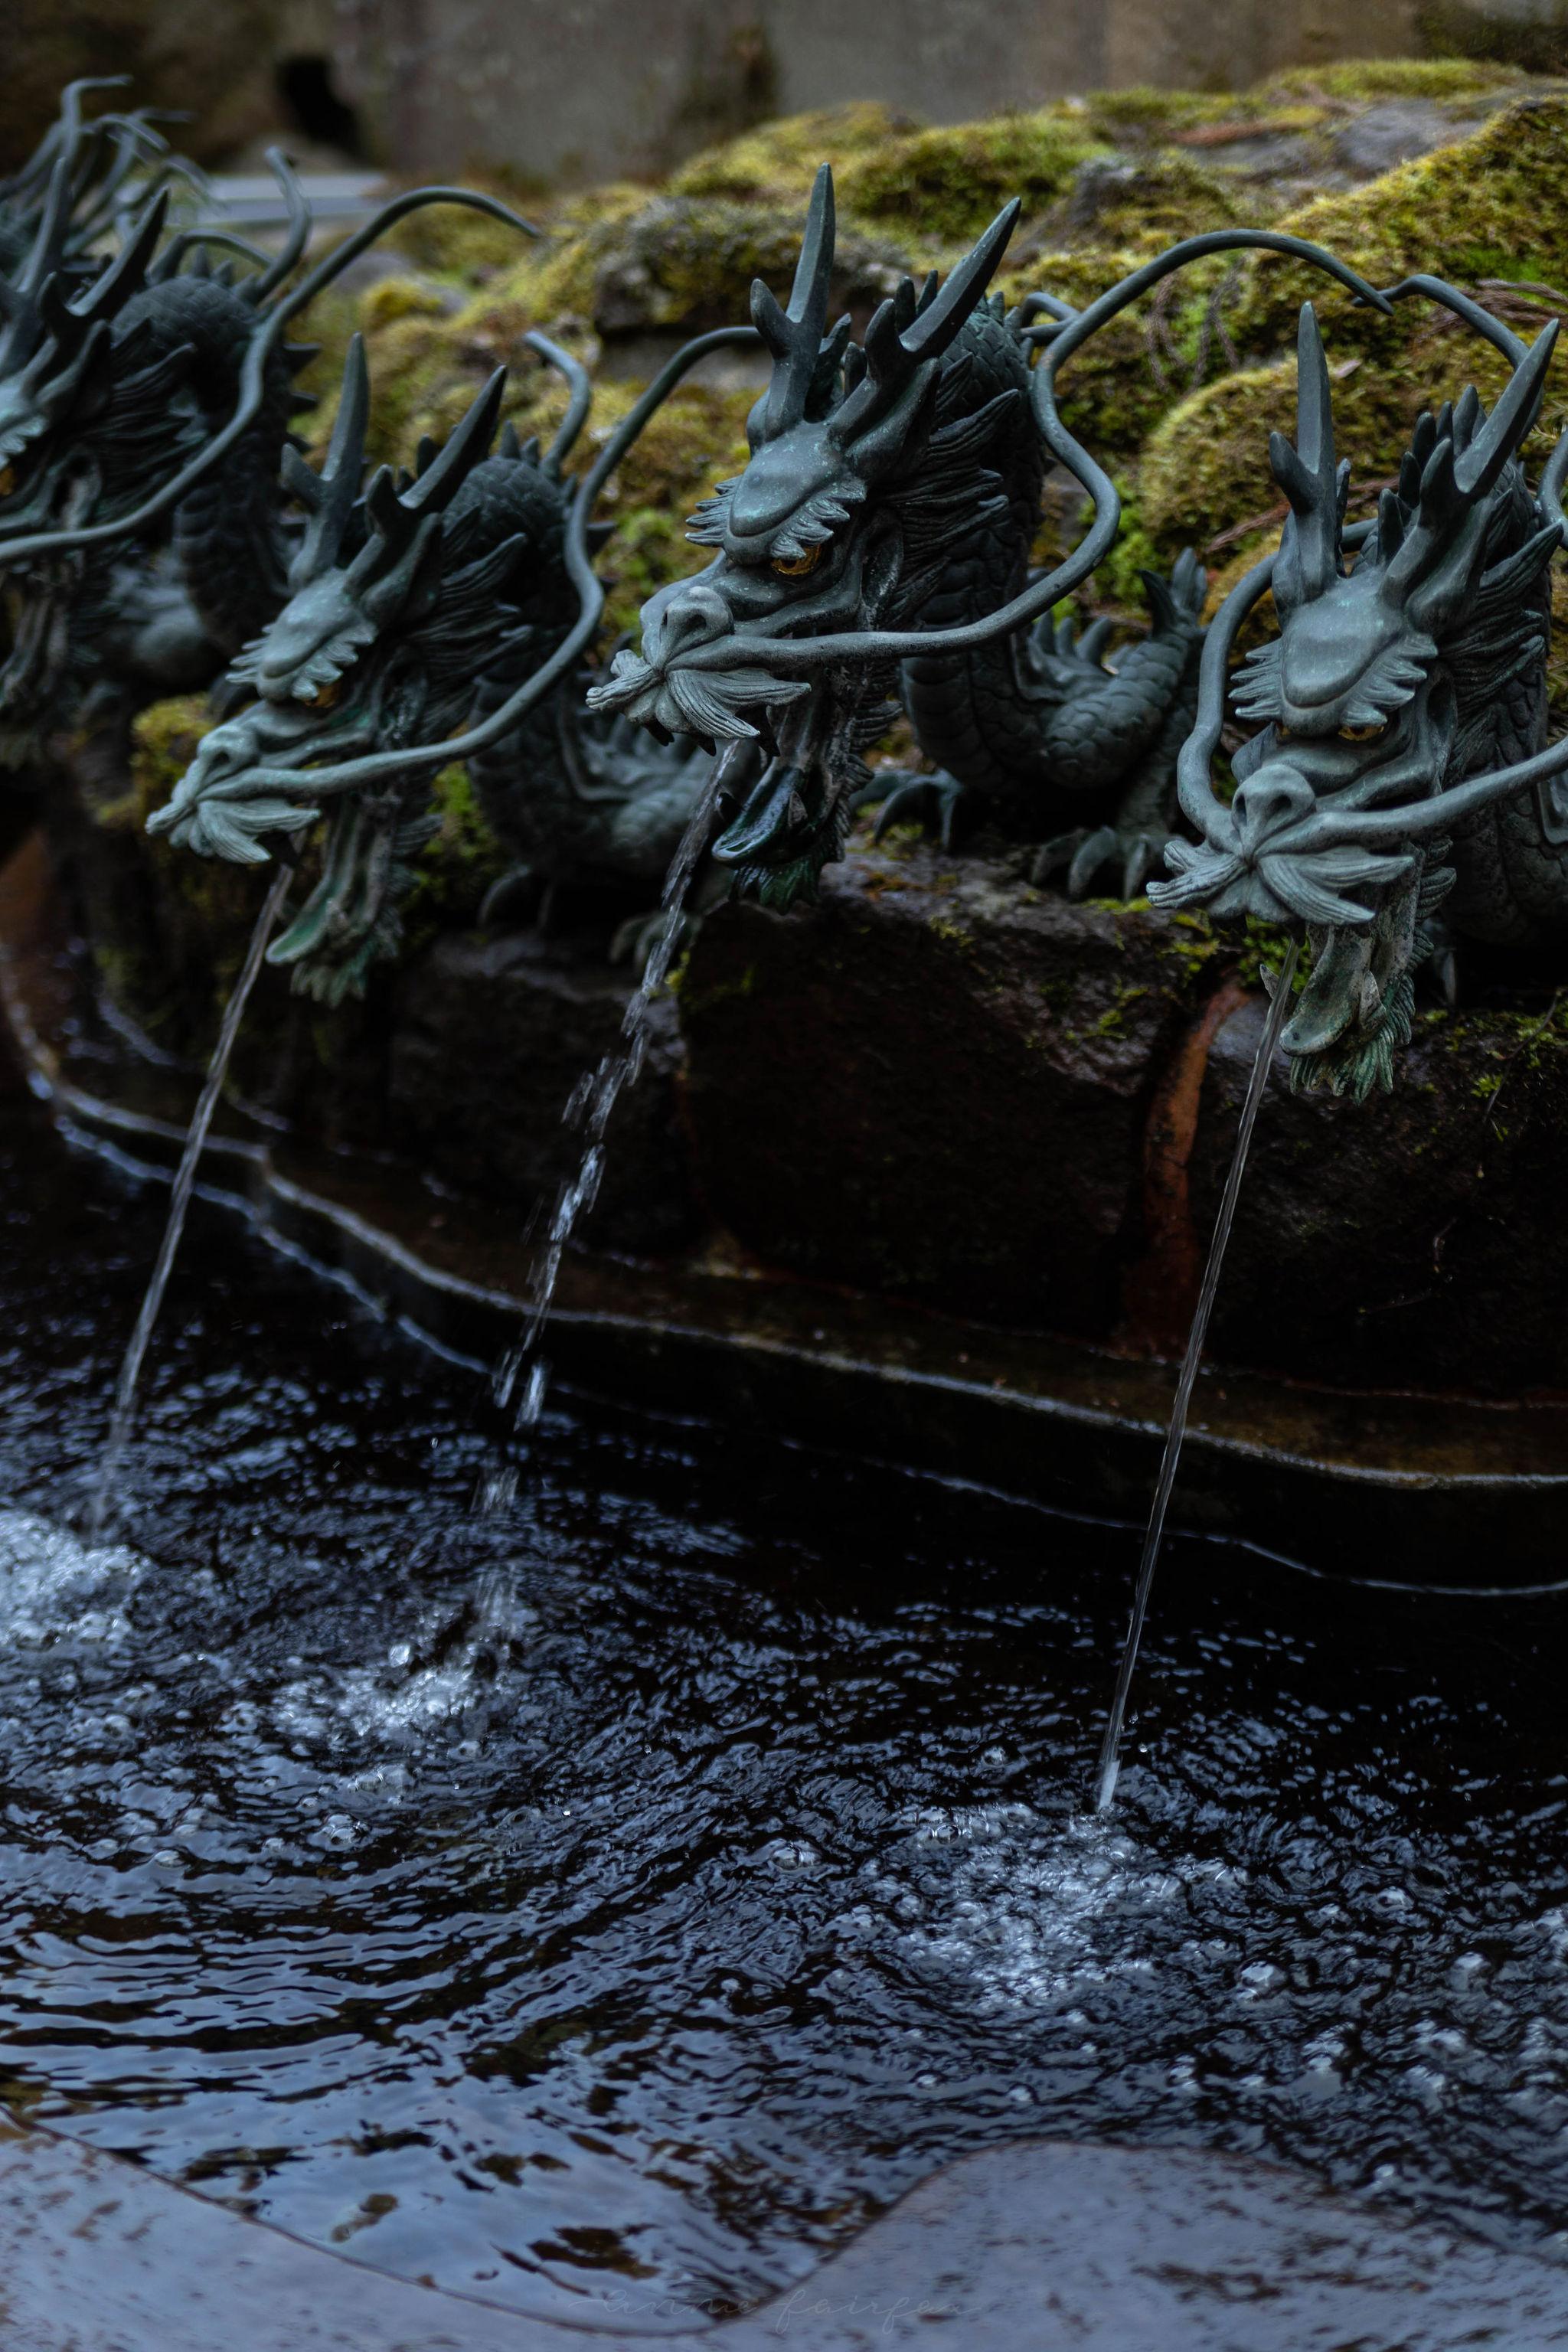 Hakone Dragon Fountain Chozuya Japanese Shinto Shrine Ablution Purification Ritual Cleansing in Japan